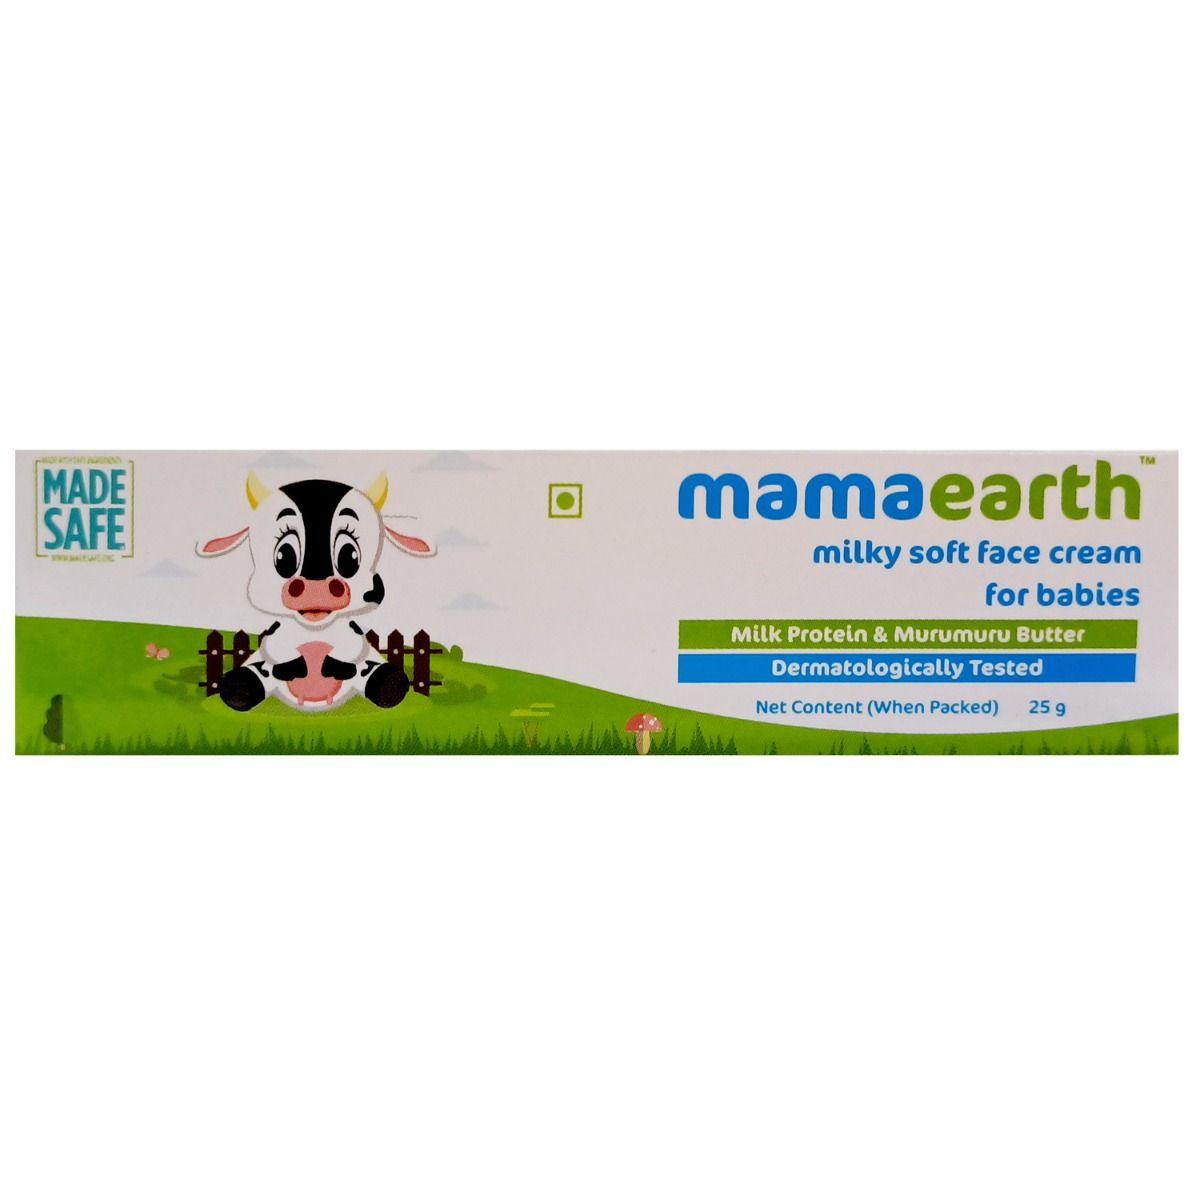 Mamaearth Milky Soft Face Cream Babies, 25 gm